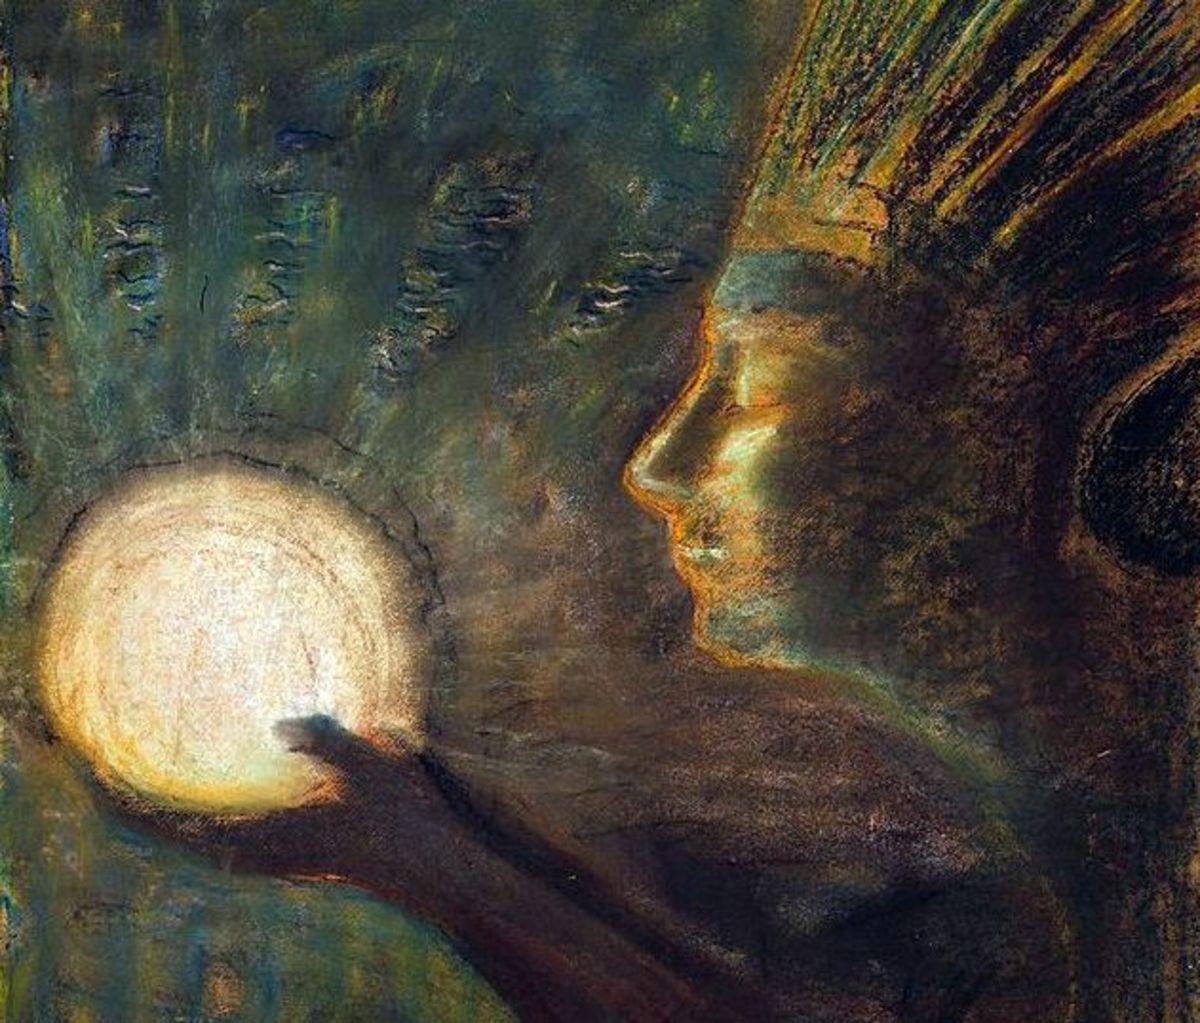 """Friendship"" by Mikalojus Konstantinas Ciurlionis, 1906"